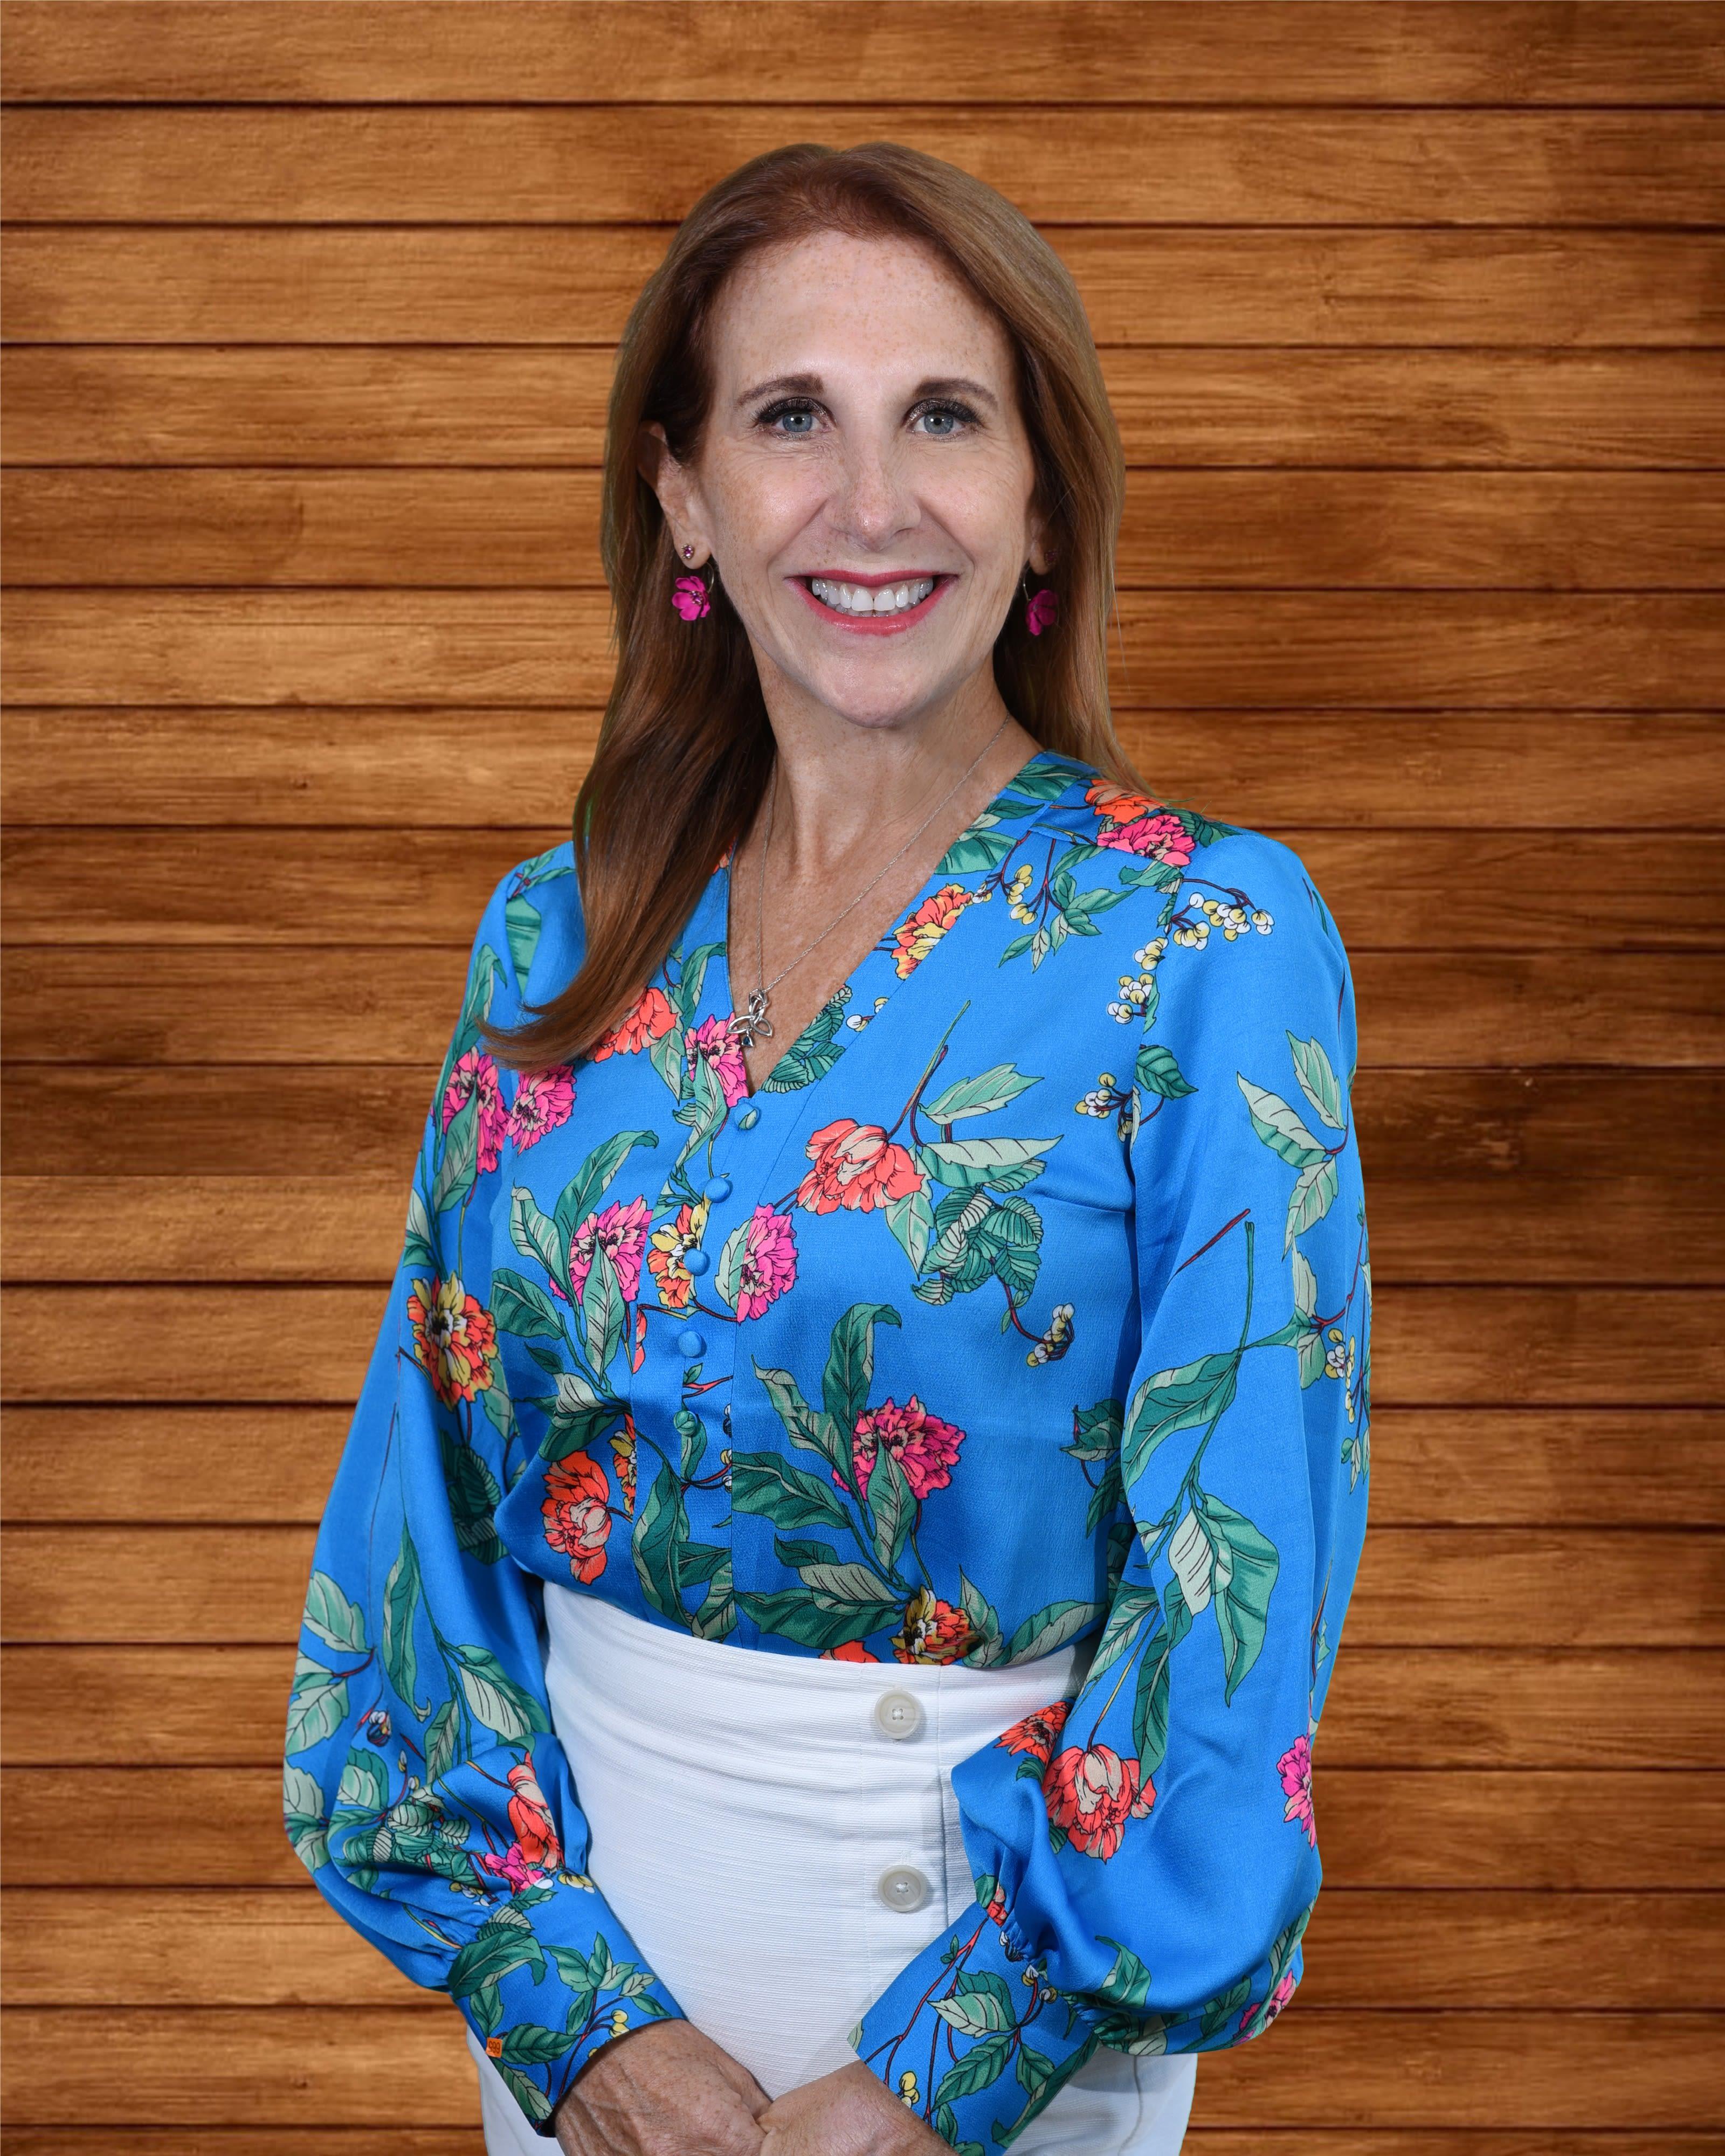 Deb Shane, Vice President, Creative Marketing at Elegance Living, LLC